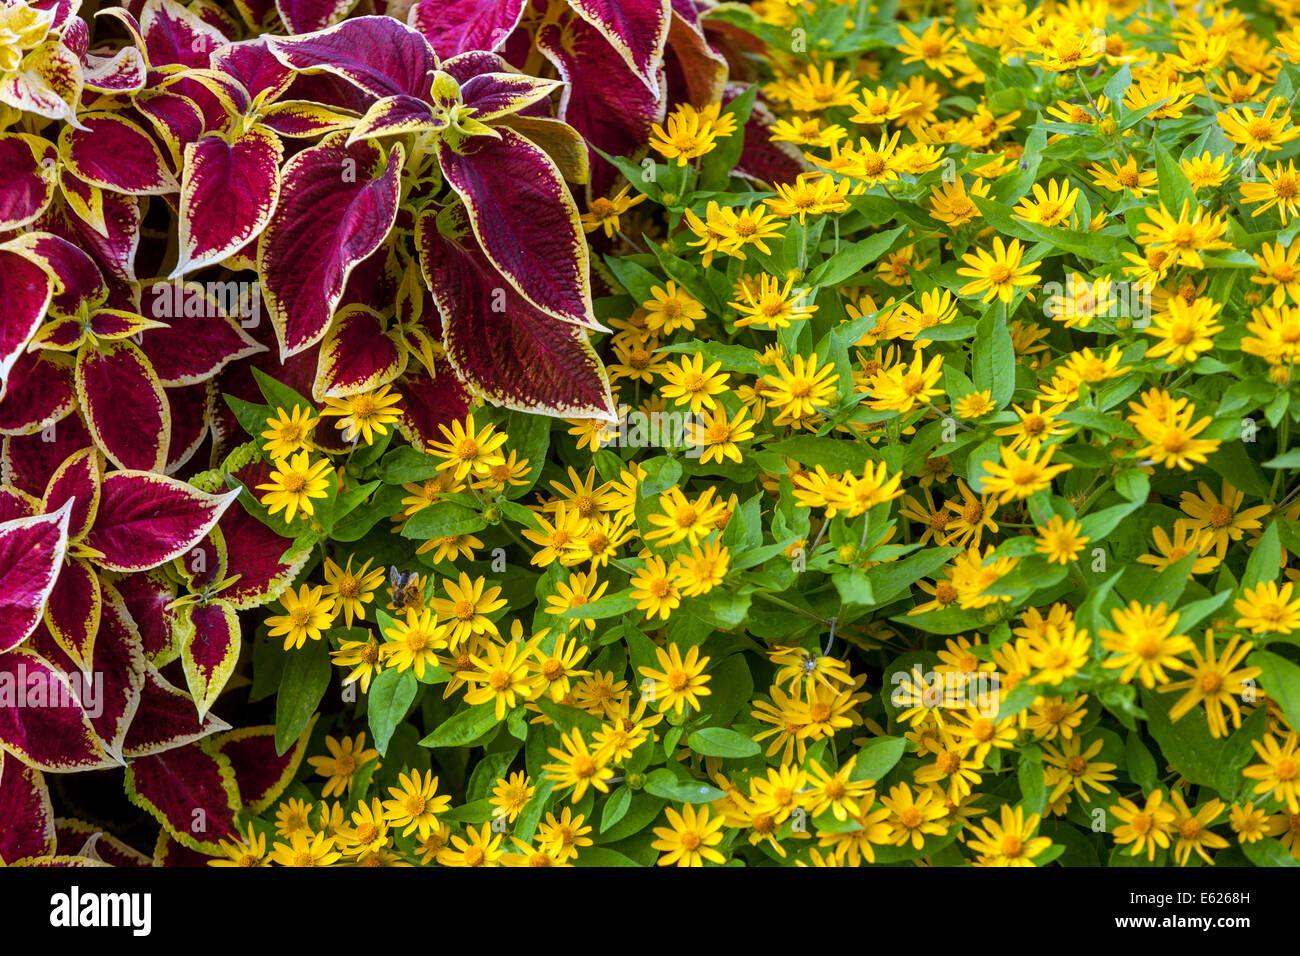 Melampodium stock photos melampodium stock images alamy colorful flower bed of annual flowers coleus blumel wizard scarlet melampodium izmirmasajfo Image collections